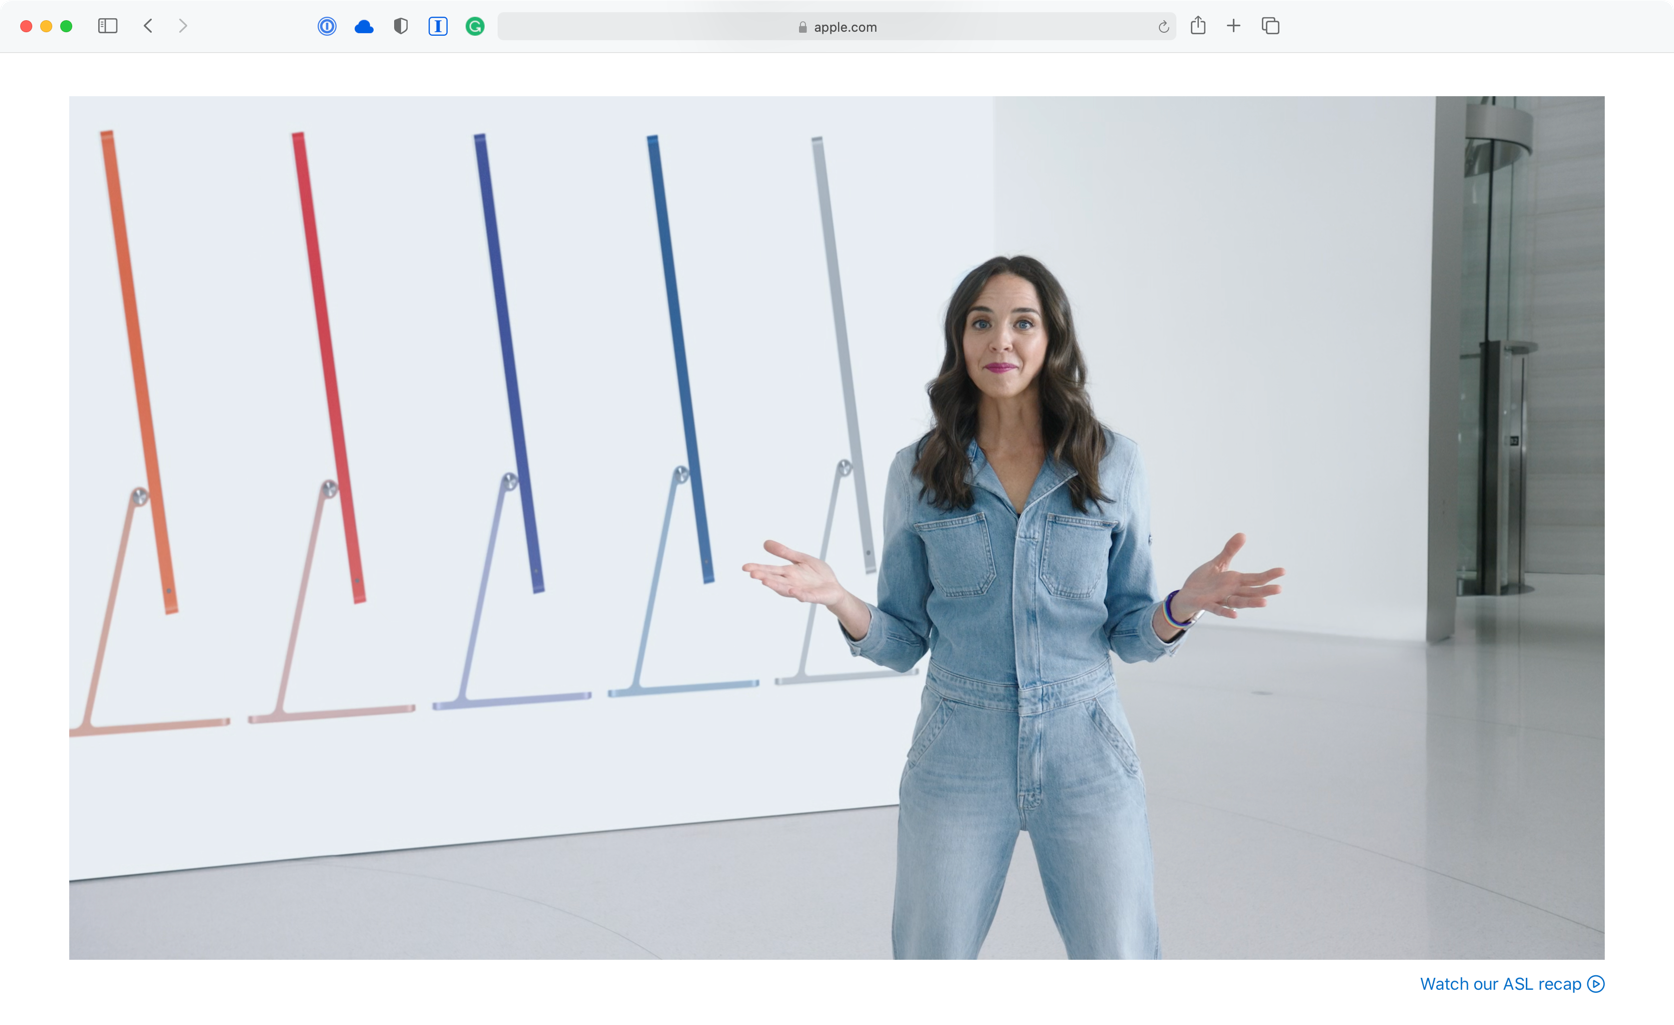 Apple iMac Hero Shot in Event Video